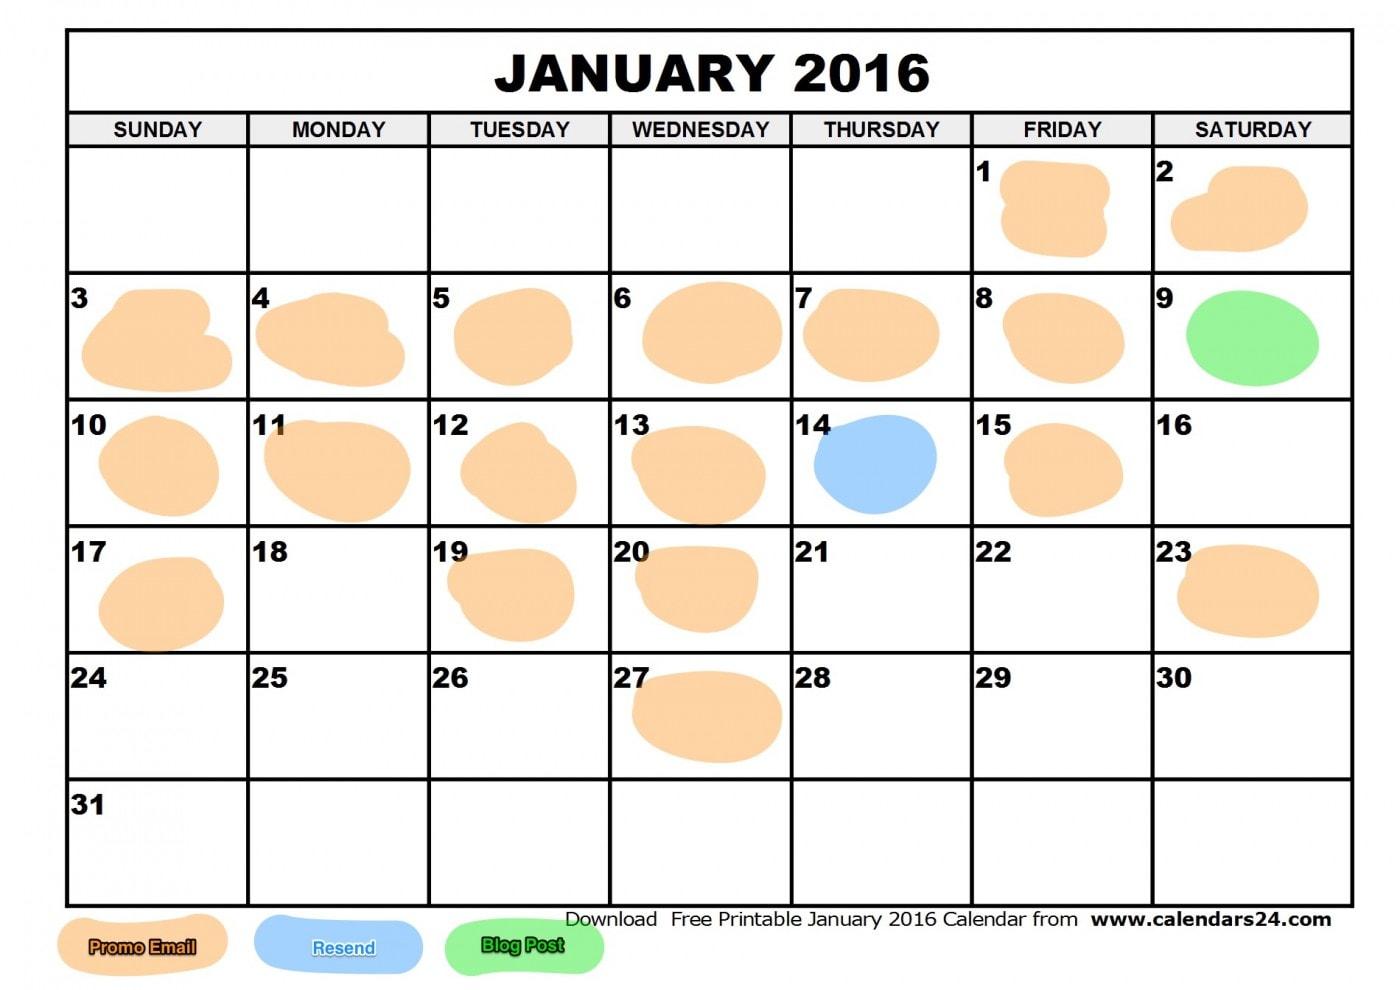 AH January 2016 calendar